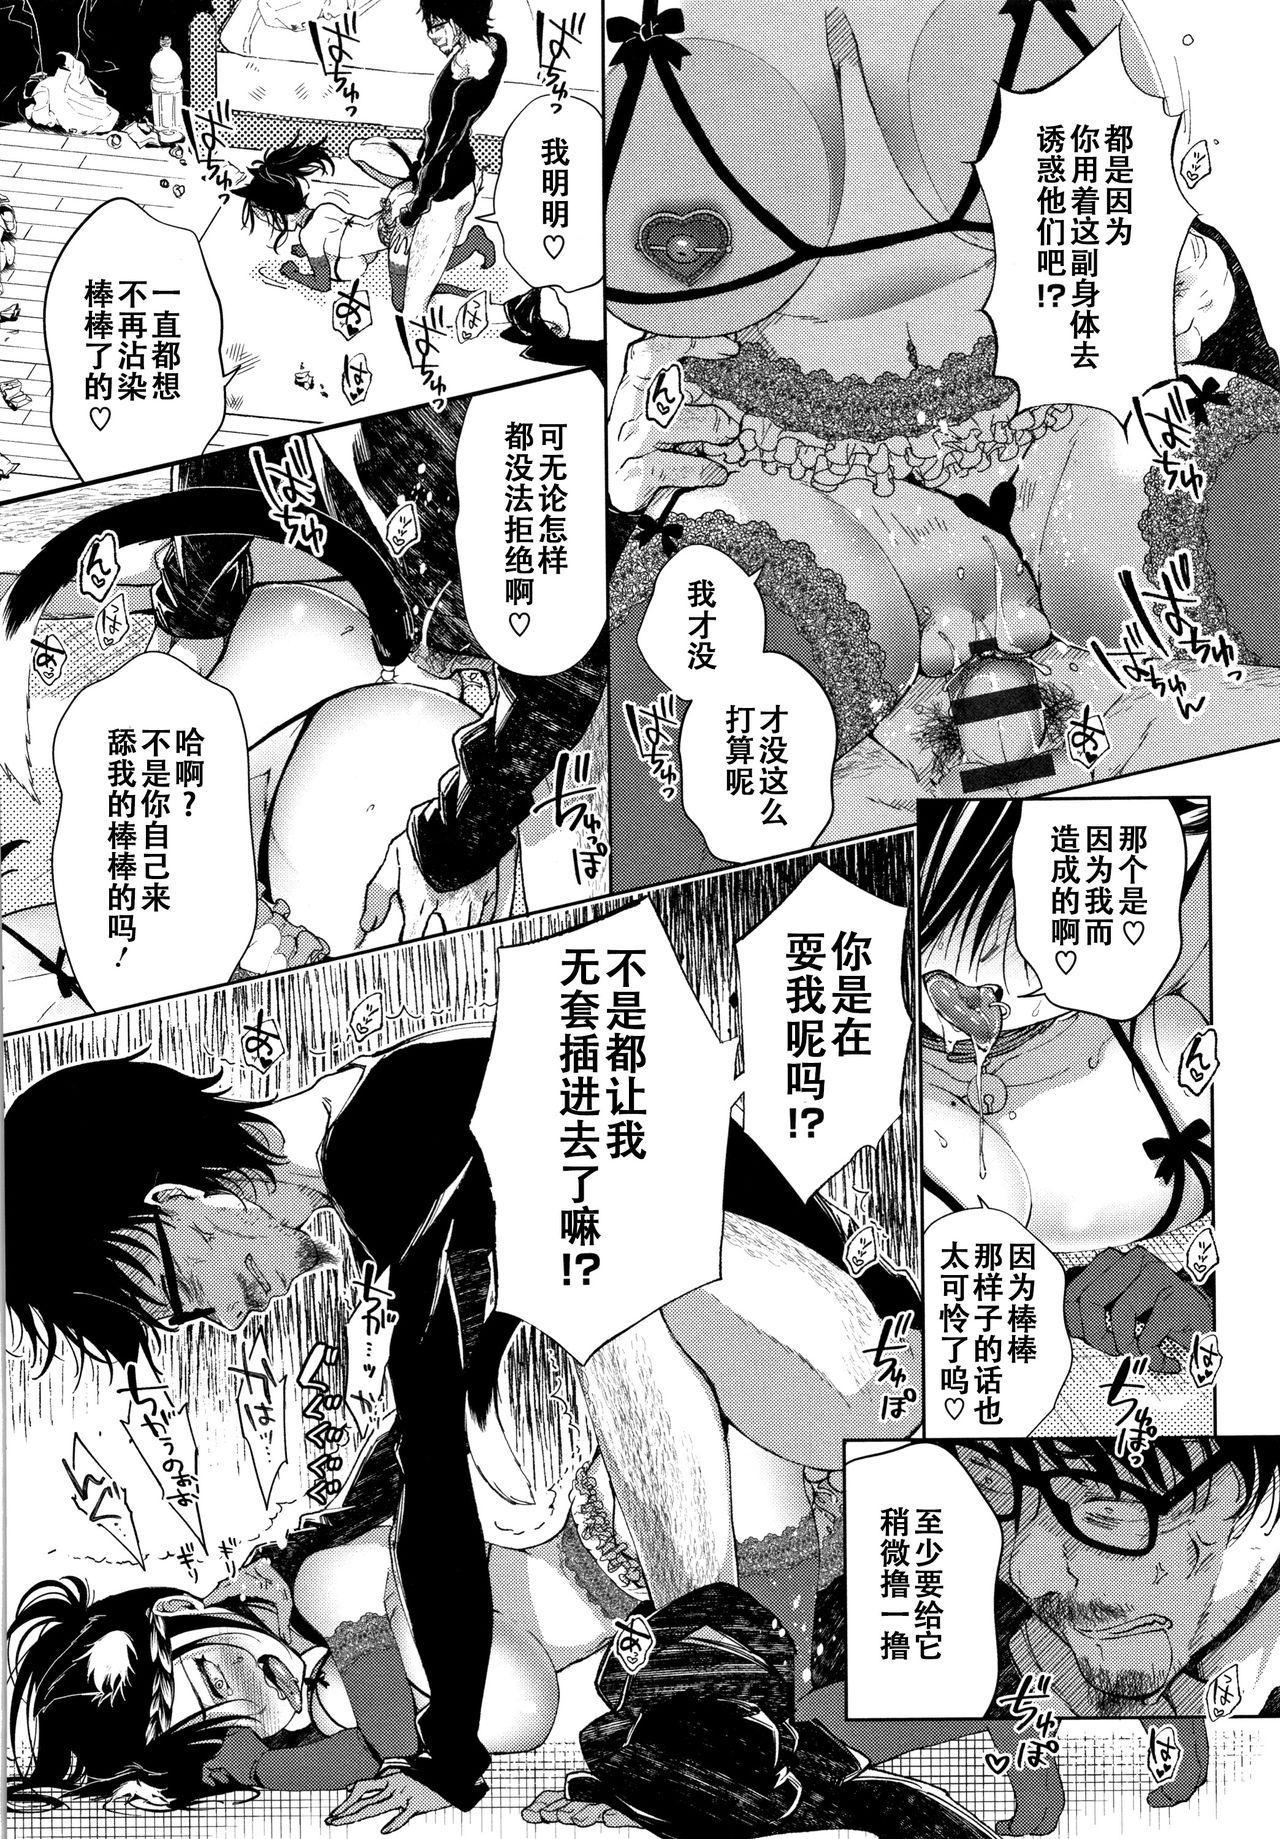 [Achumuchi] Saijaku Gal wa Ikizurai! - The weakest pussy is hard to go.ch.1-8 [Chinese] [战栗的玻璃棒汉化] [Ongoing] 24